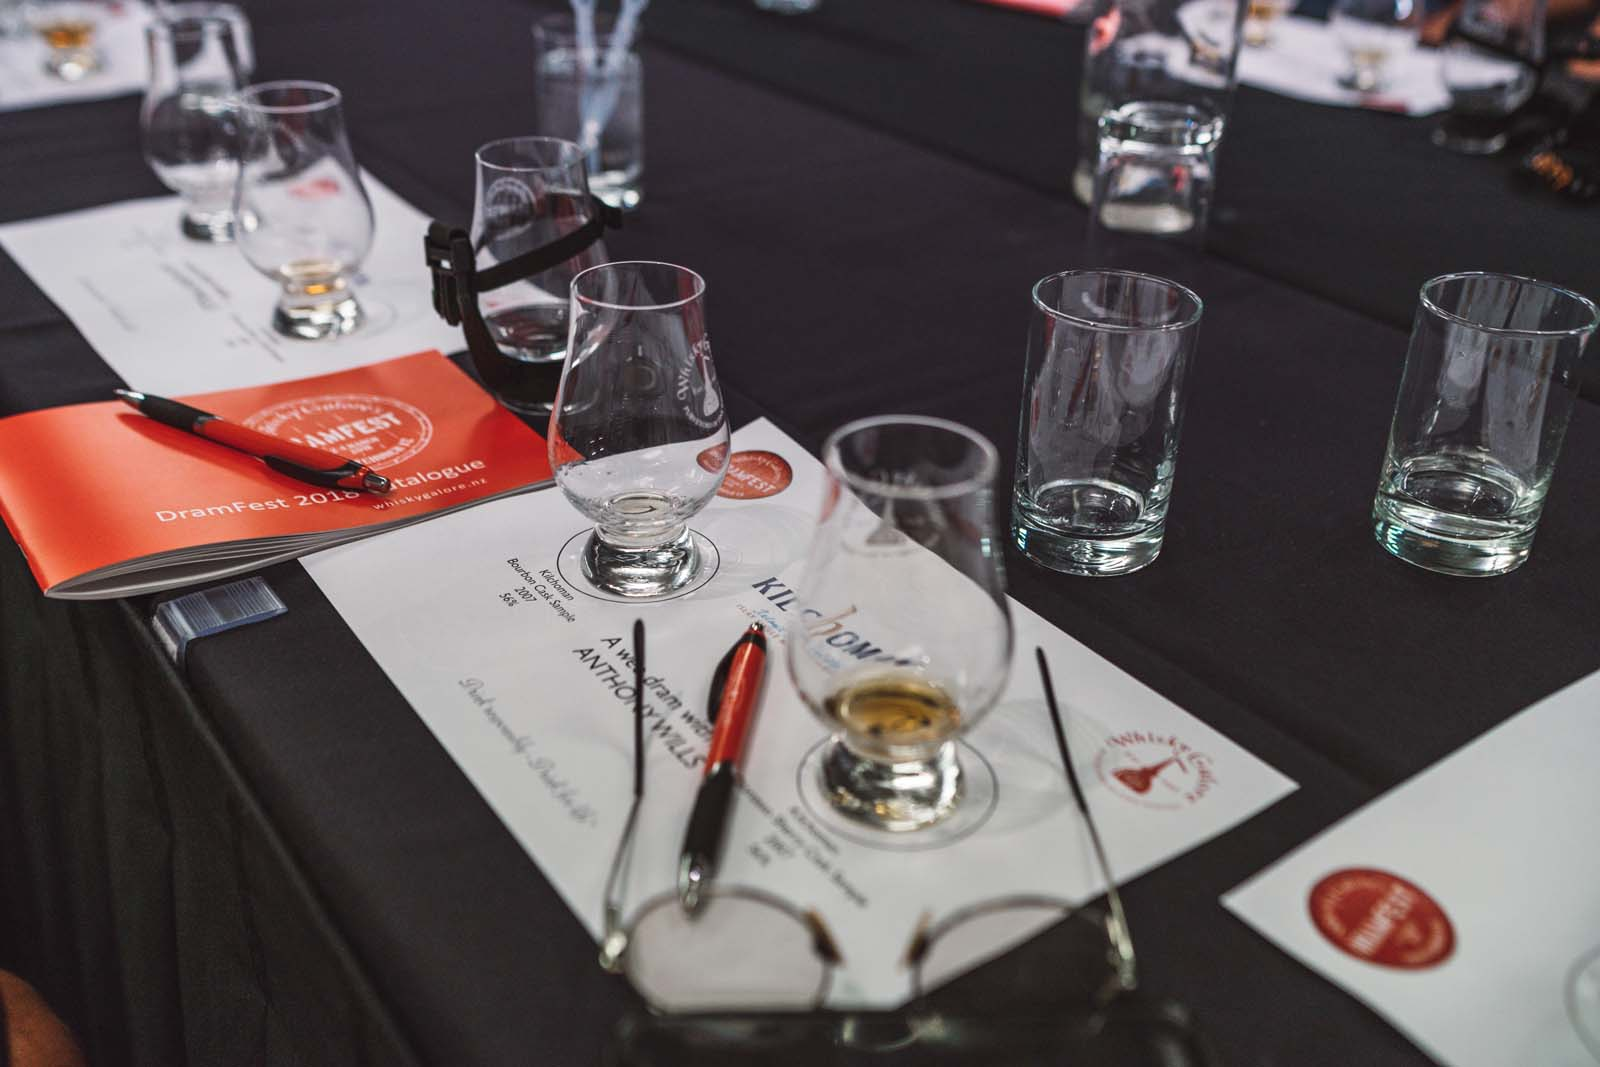 Dramfest 2018 for Whisky Galore-434.jpg